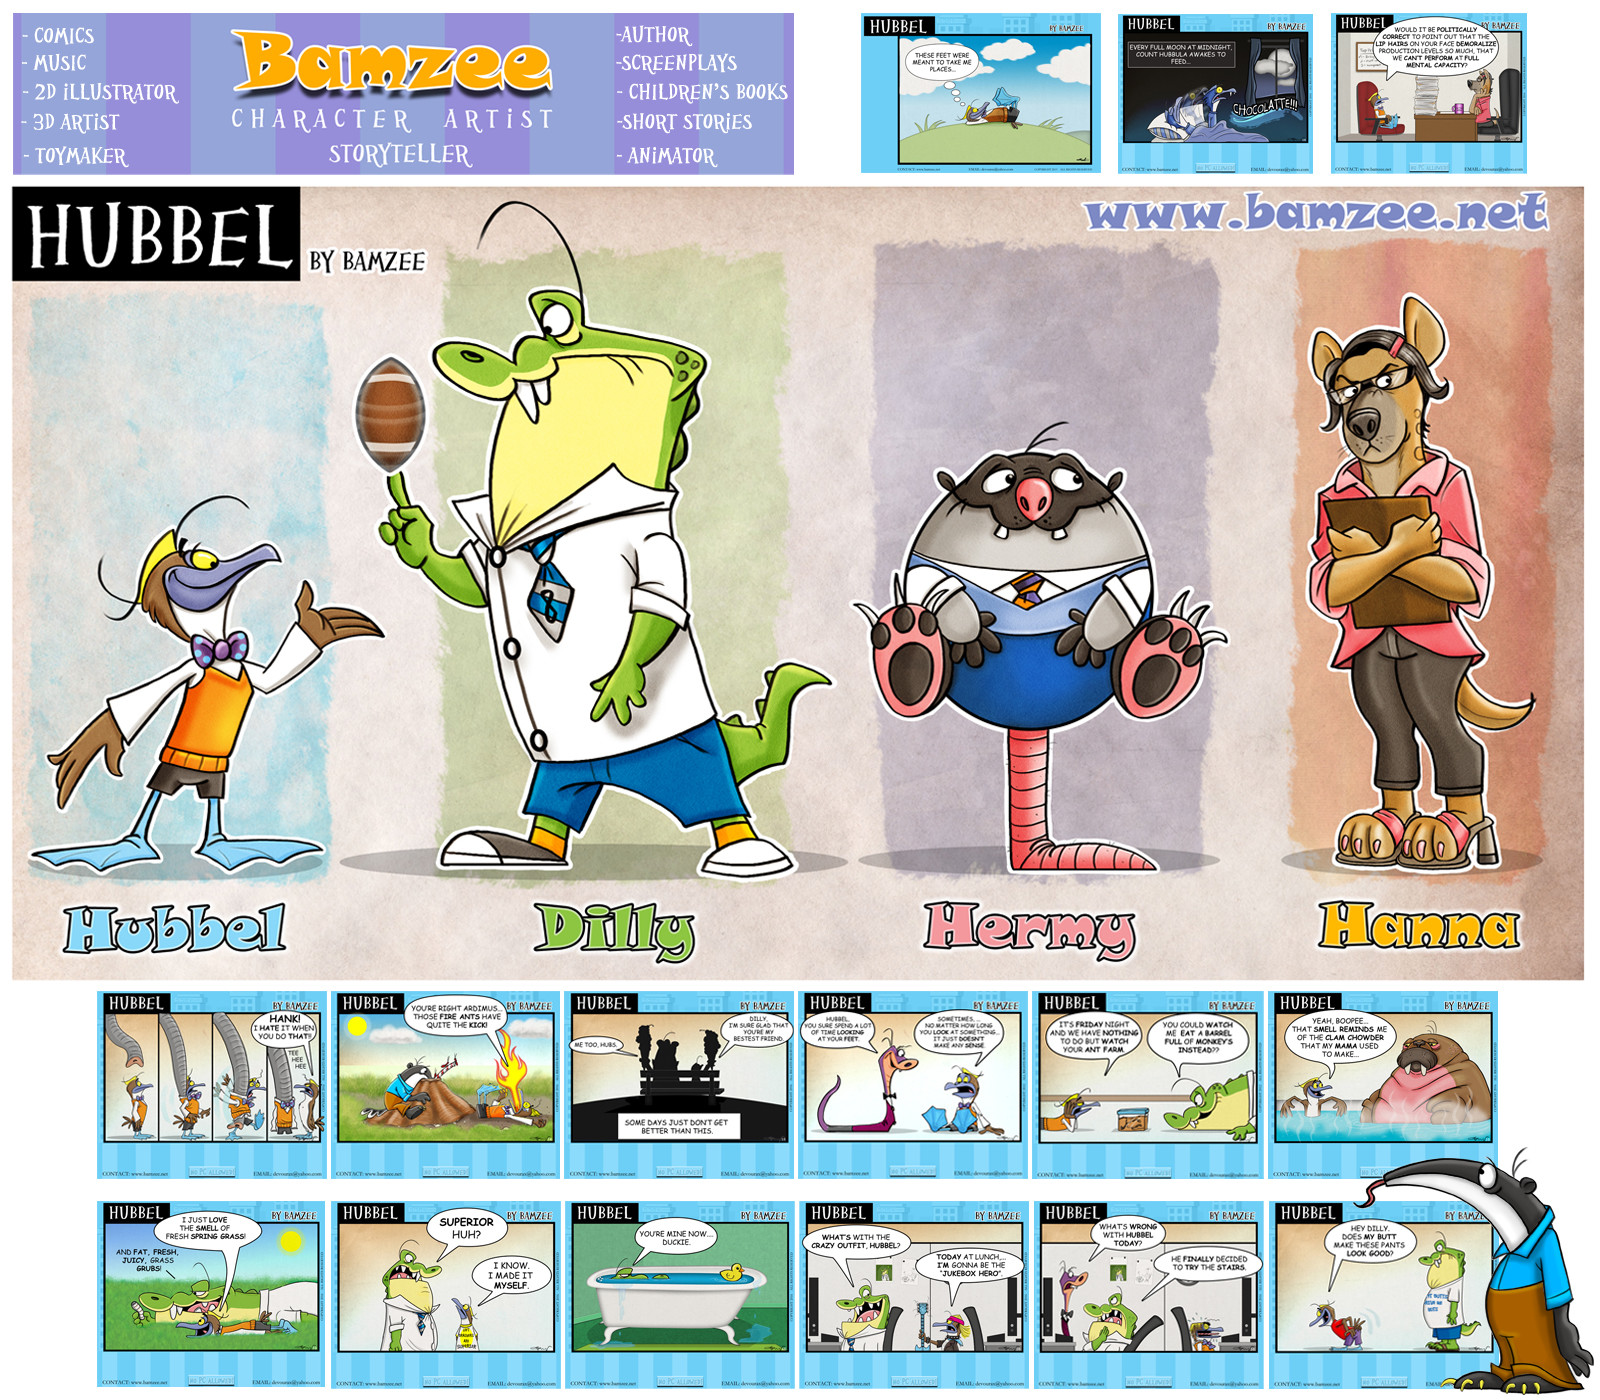 B allen bamzee patreon page2